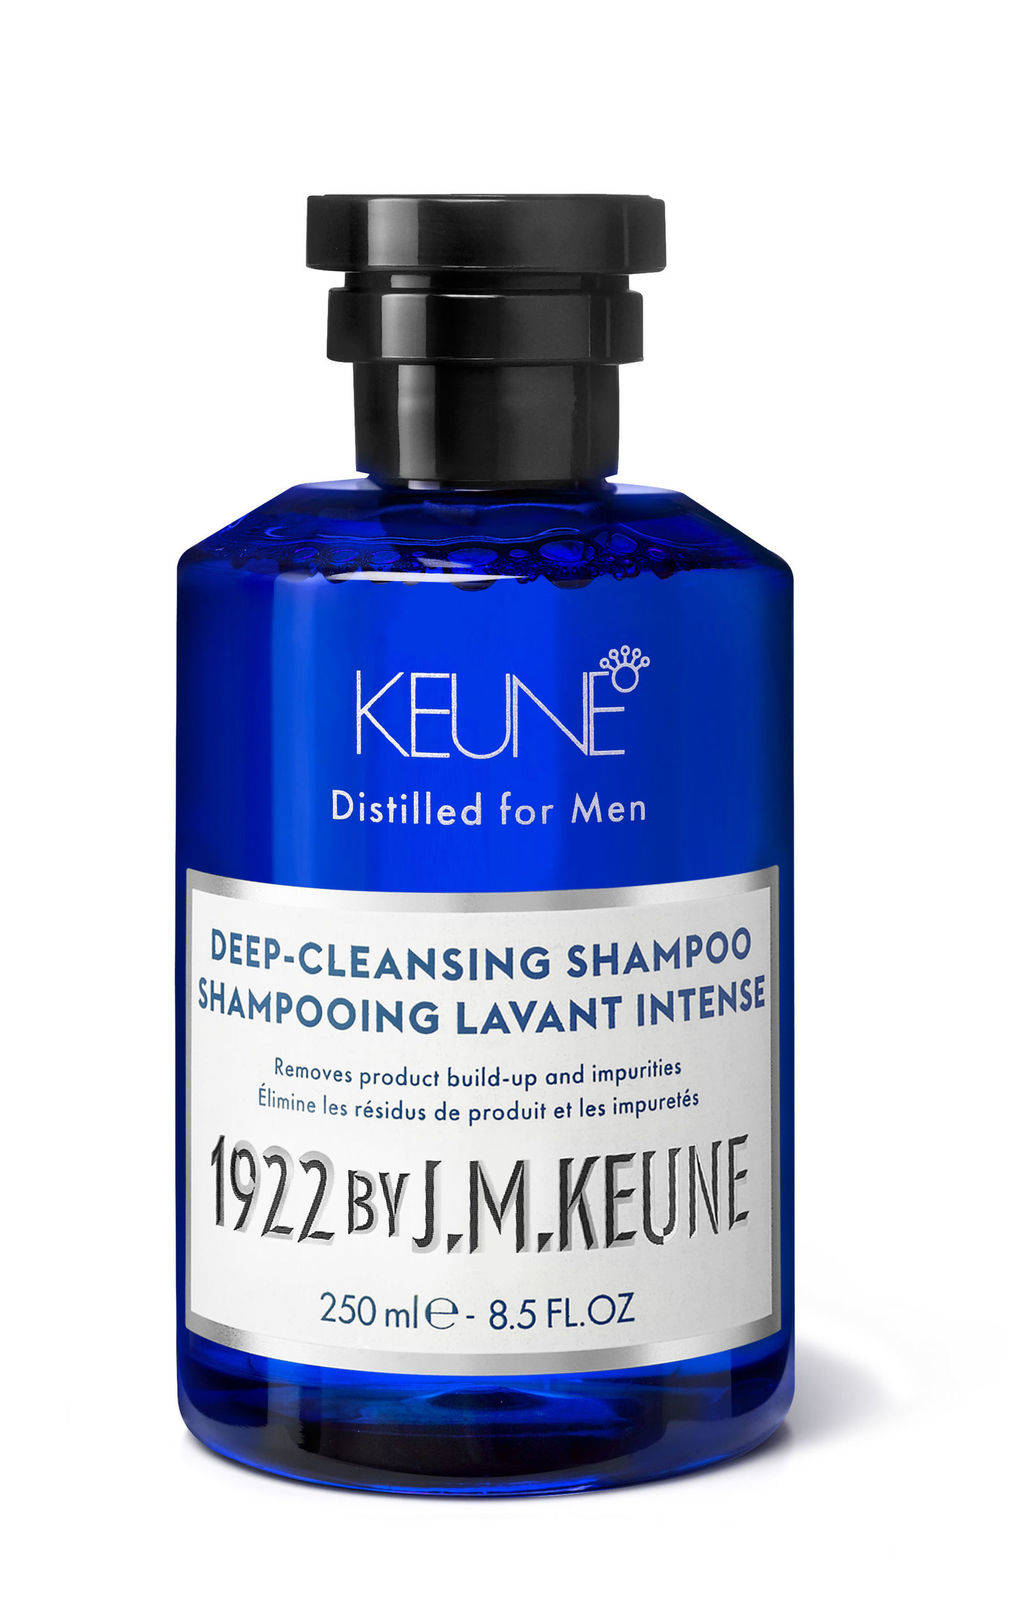 SHAMPOOING LAVANT INTENSE 250 ml - 1922 BY J.M. KEUNE